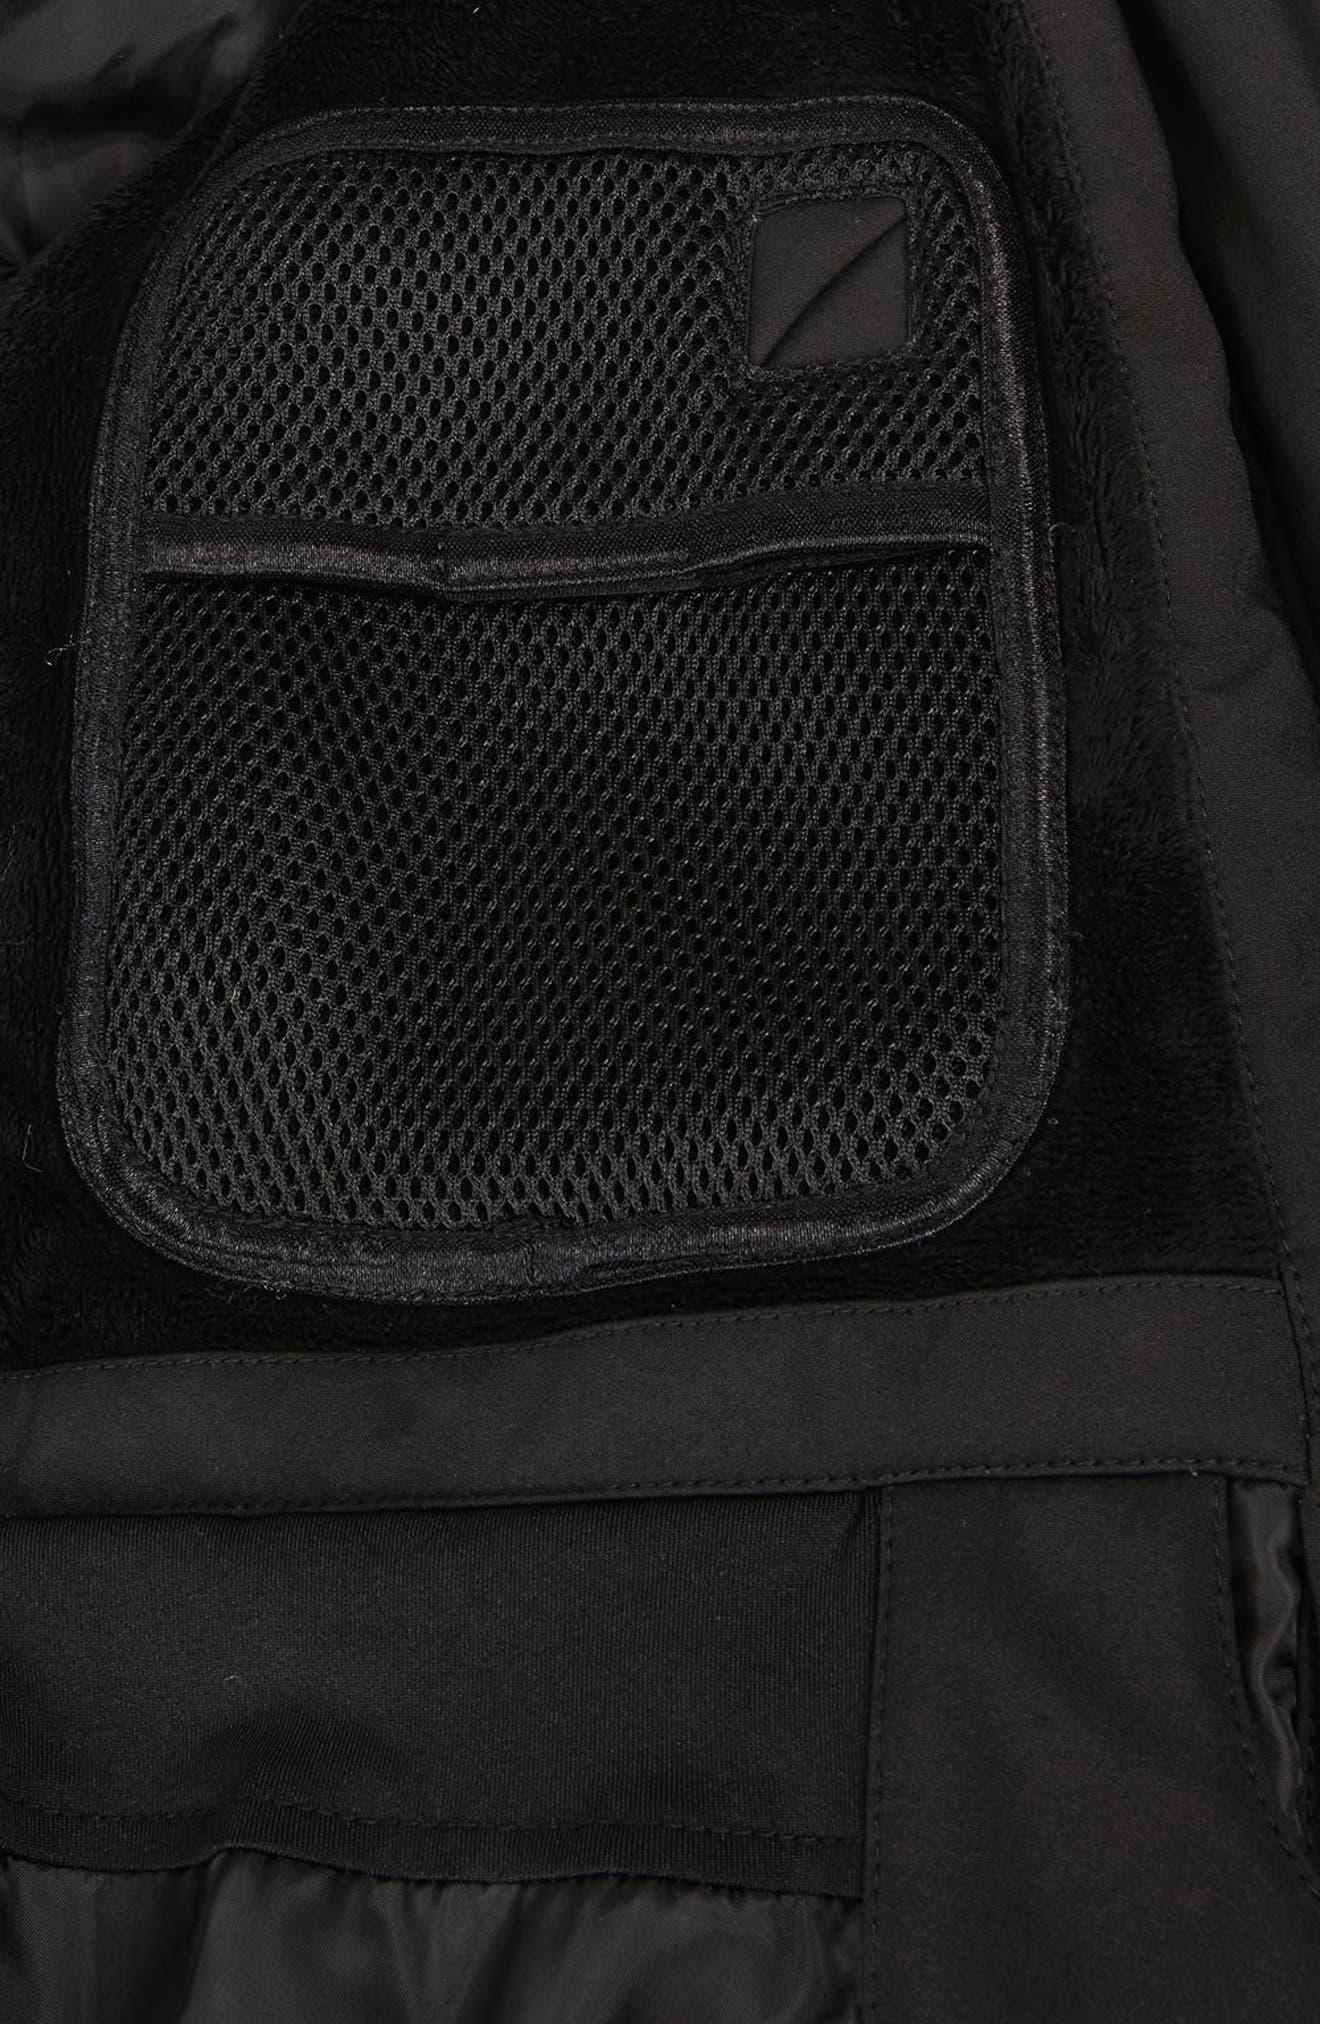 SNO Gladiator Faux Fur Hood Puffer Jacket,                             Alternate thumbnail 6, color,                             Black